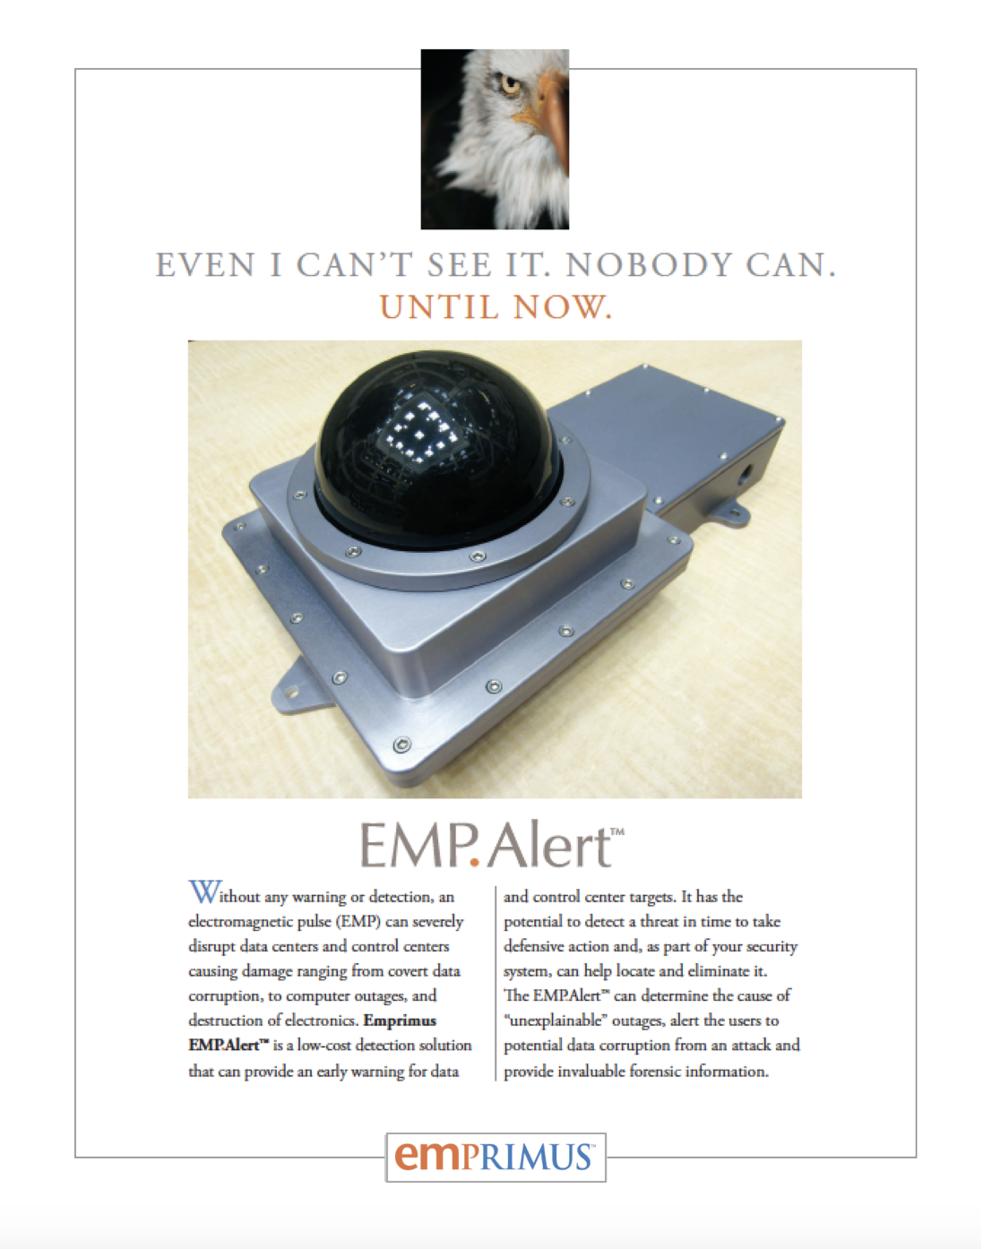 Emprimus EMP.Alert™ Brochure